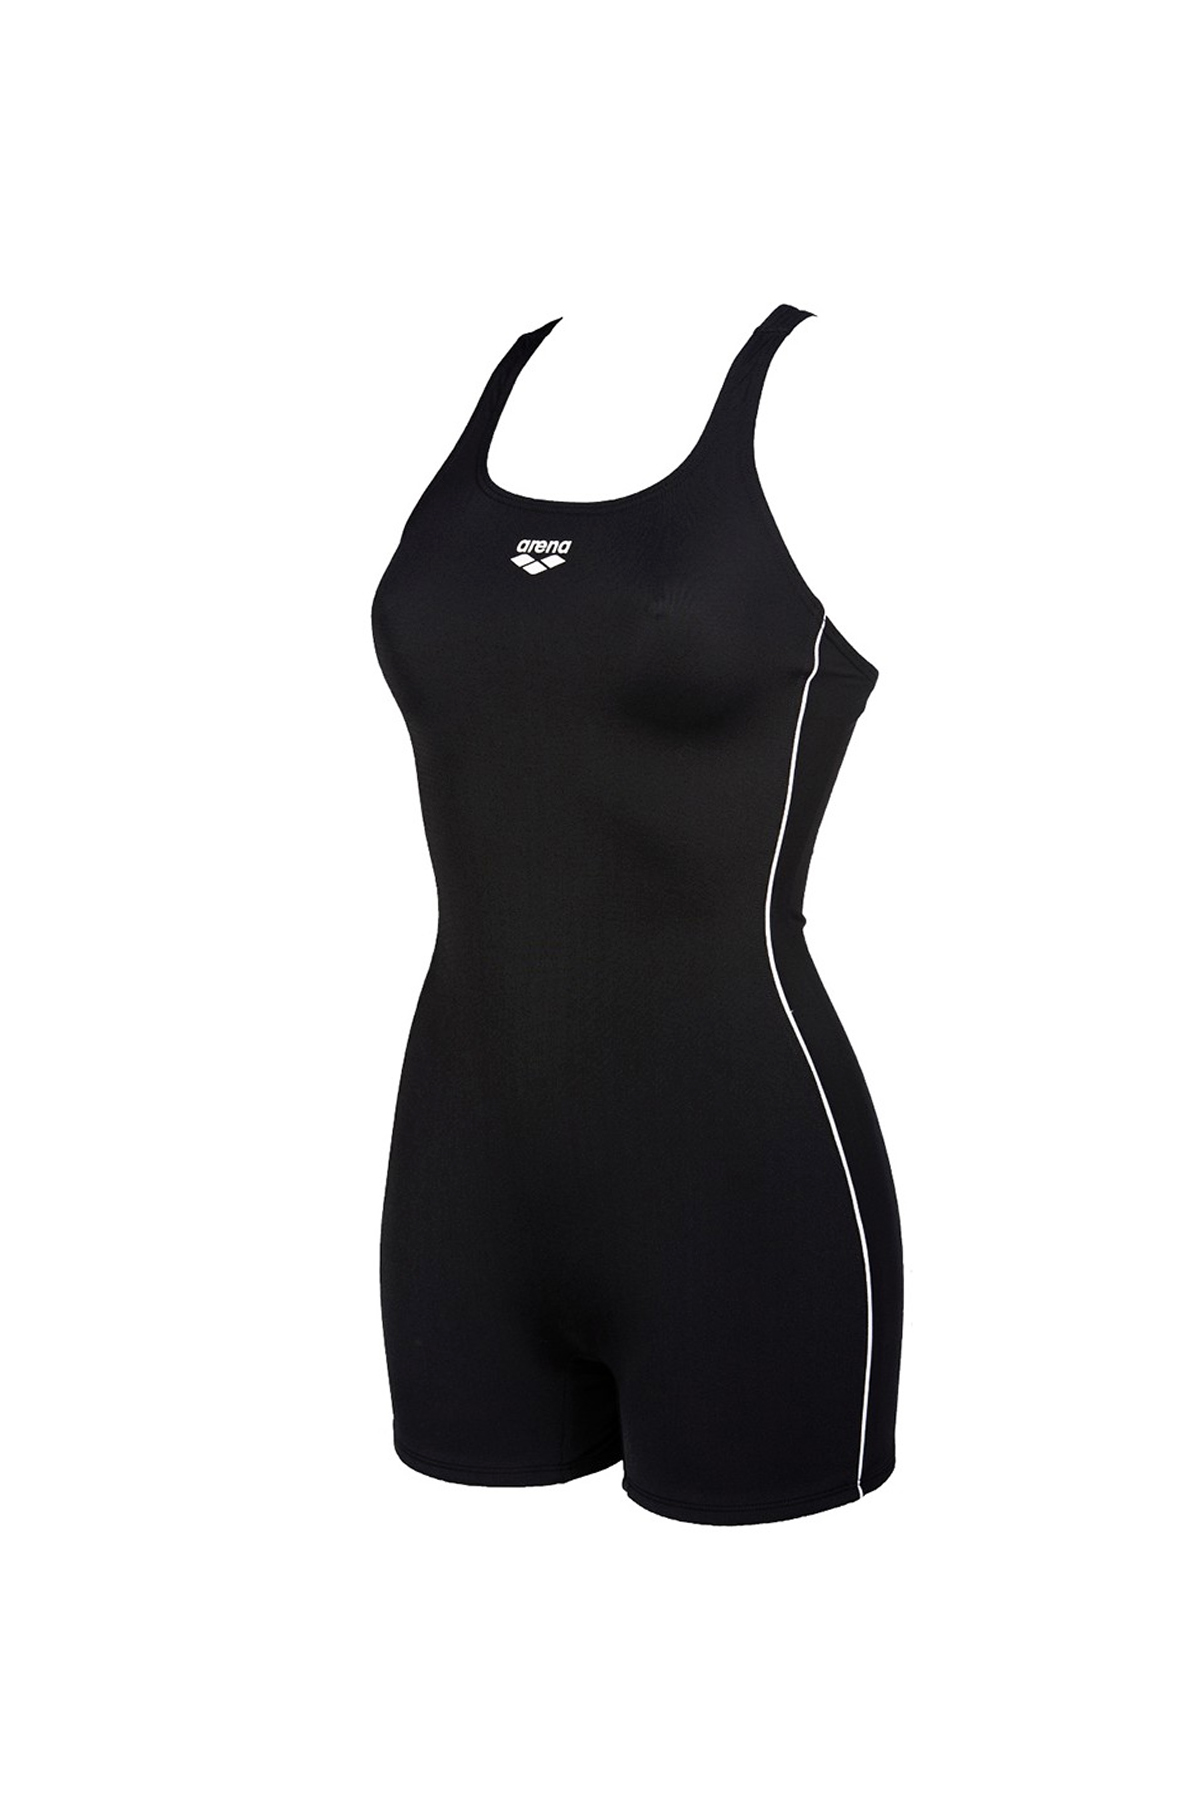 Arena Finding Kadın Yüzücü Mayo (2A809050)